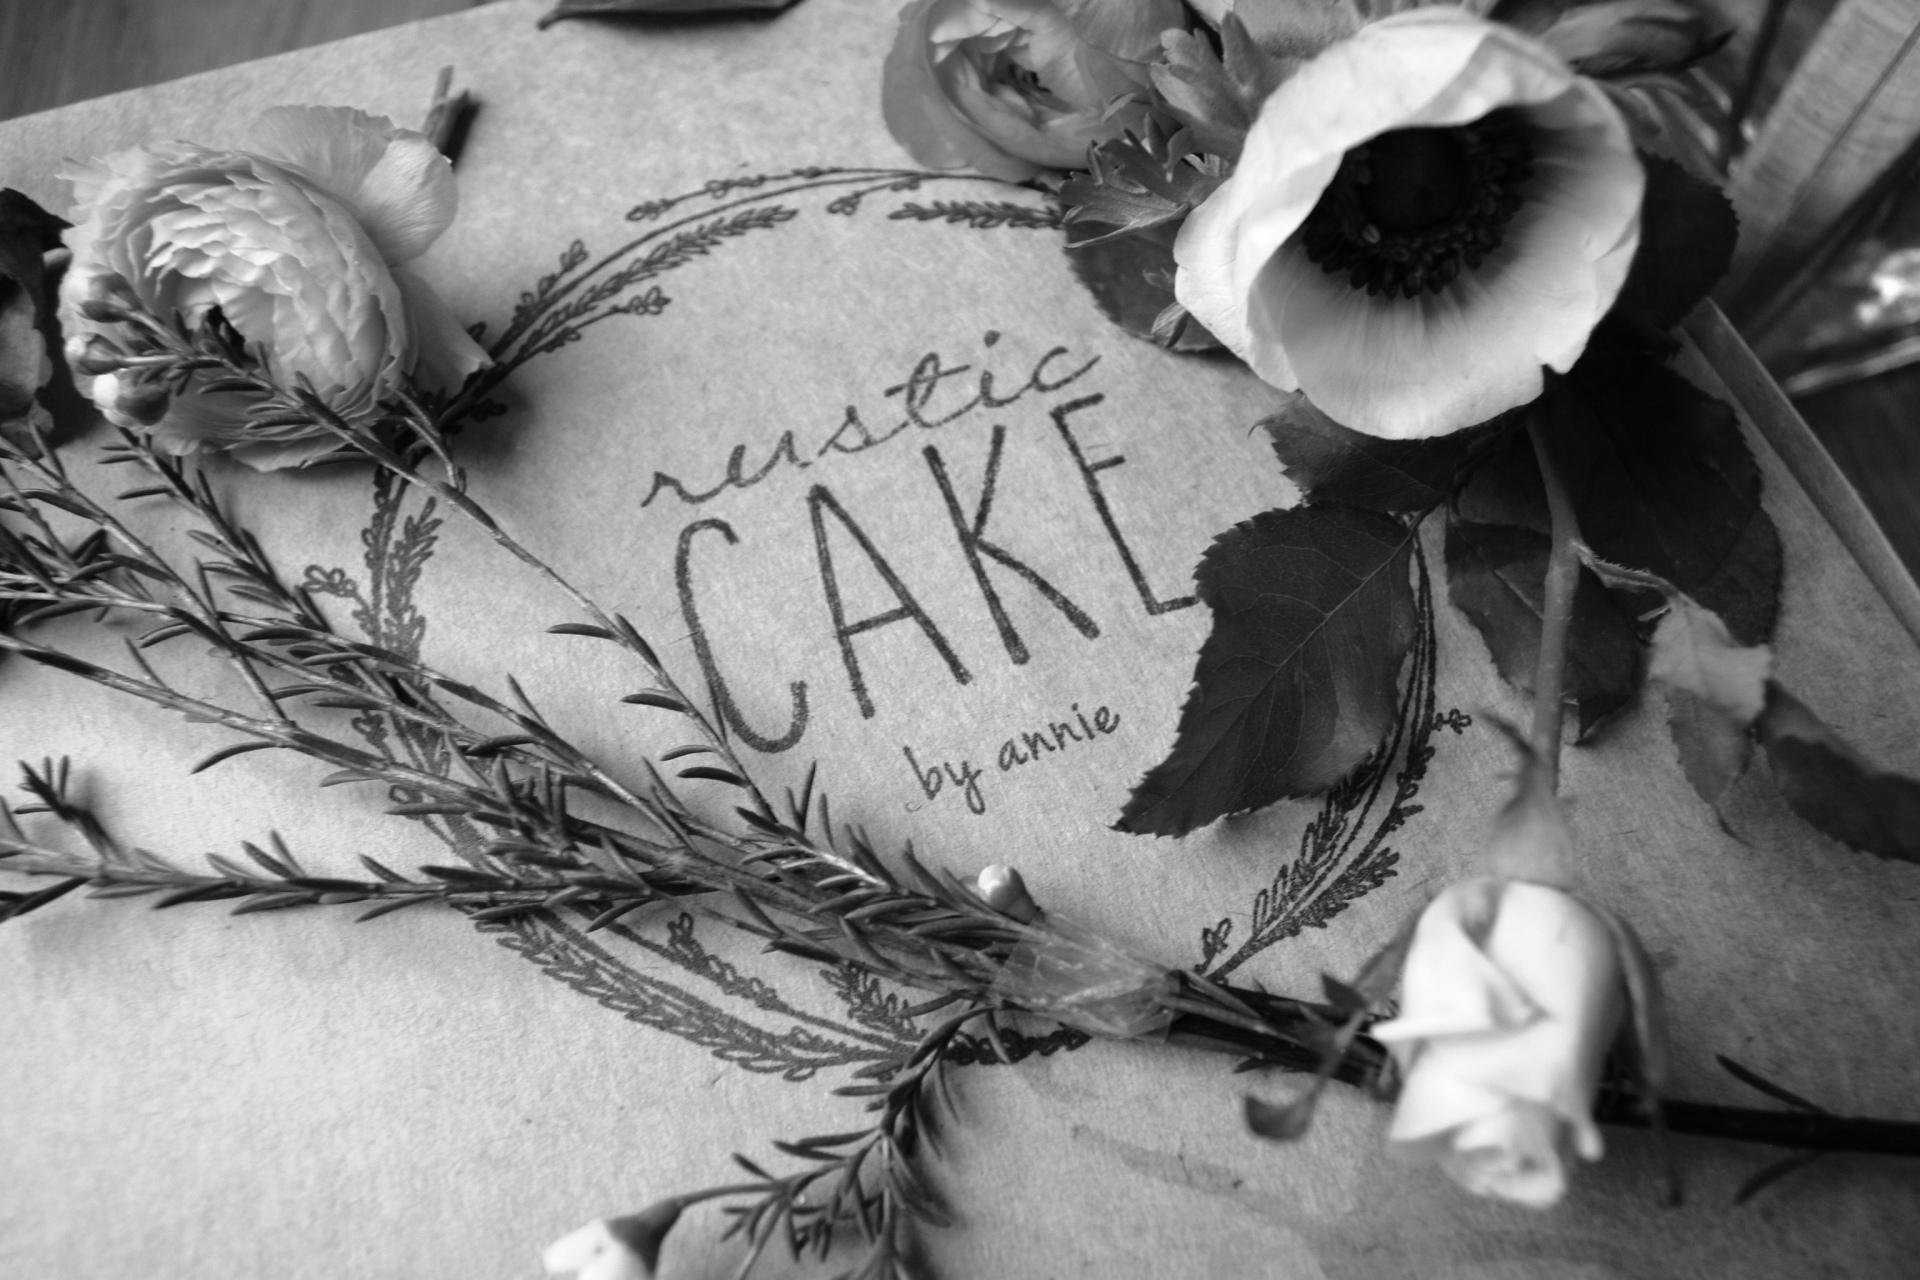 Cake gallery banner